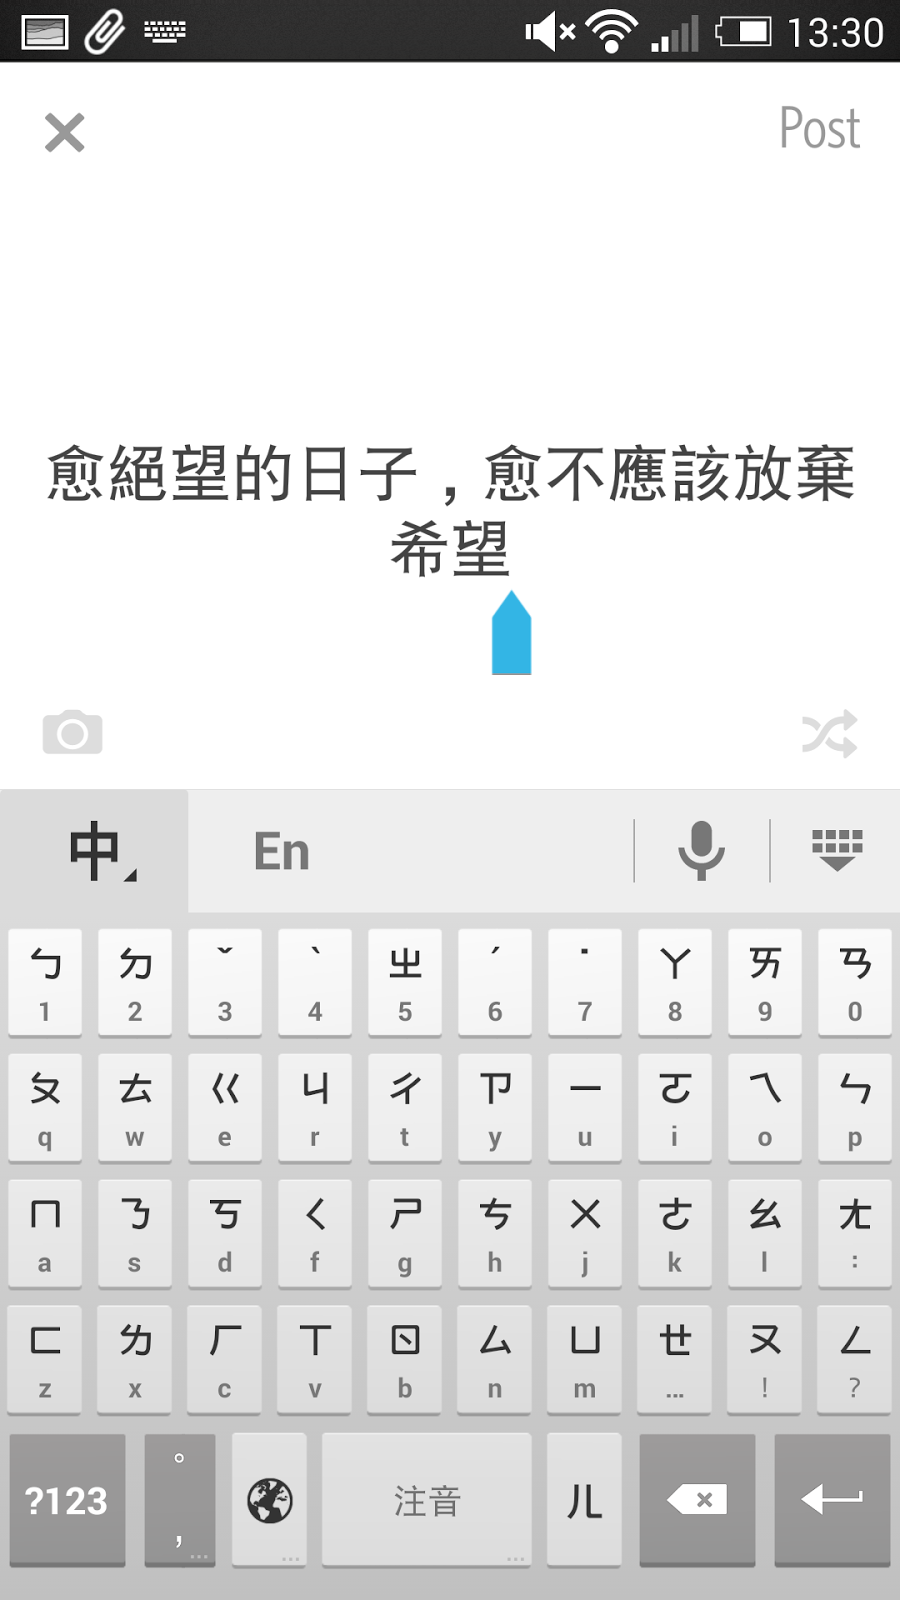 Secret 解除分享焦慮的社交 App ,對朋友匿名寫真心話 secret-07